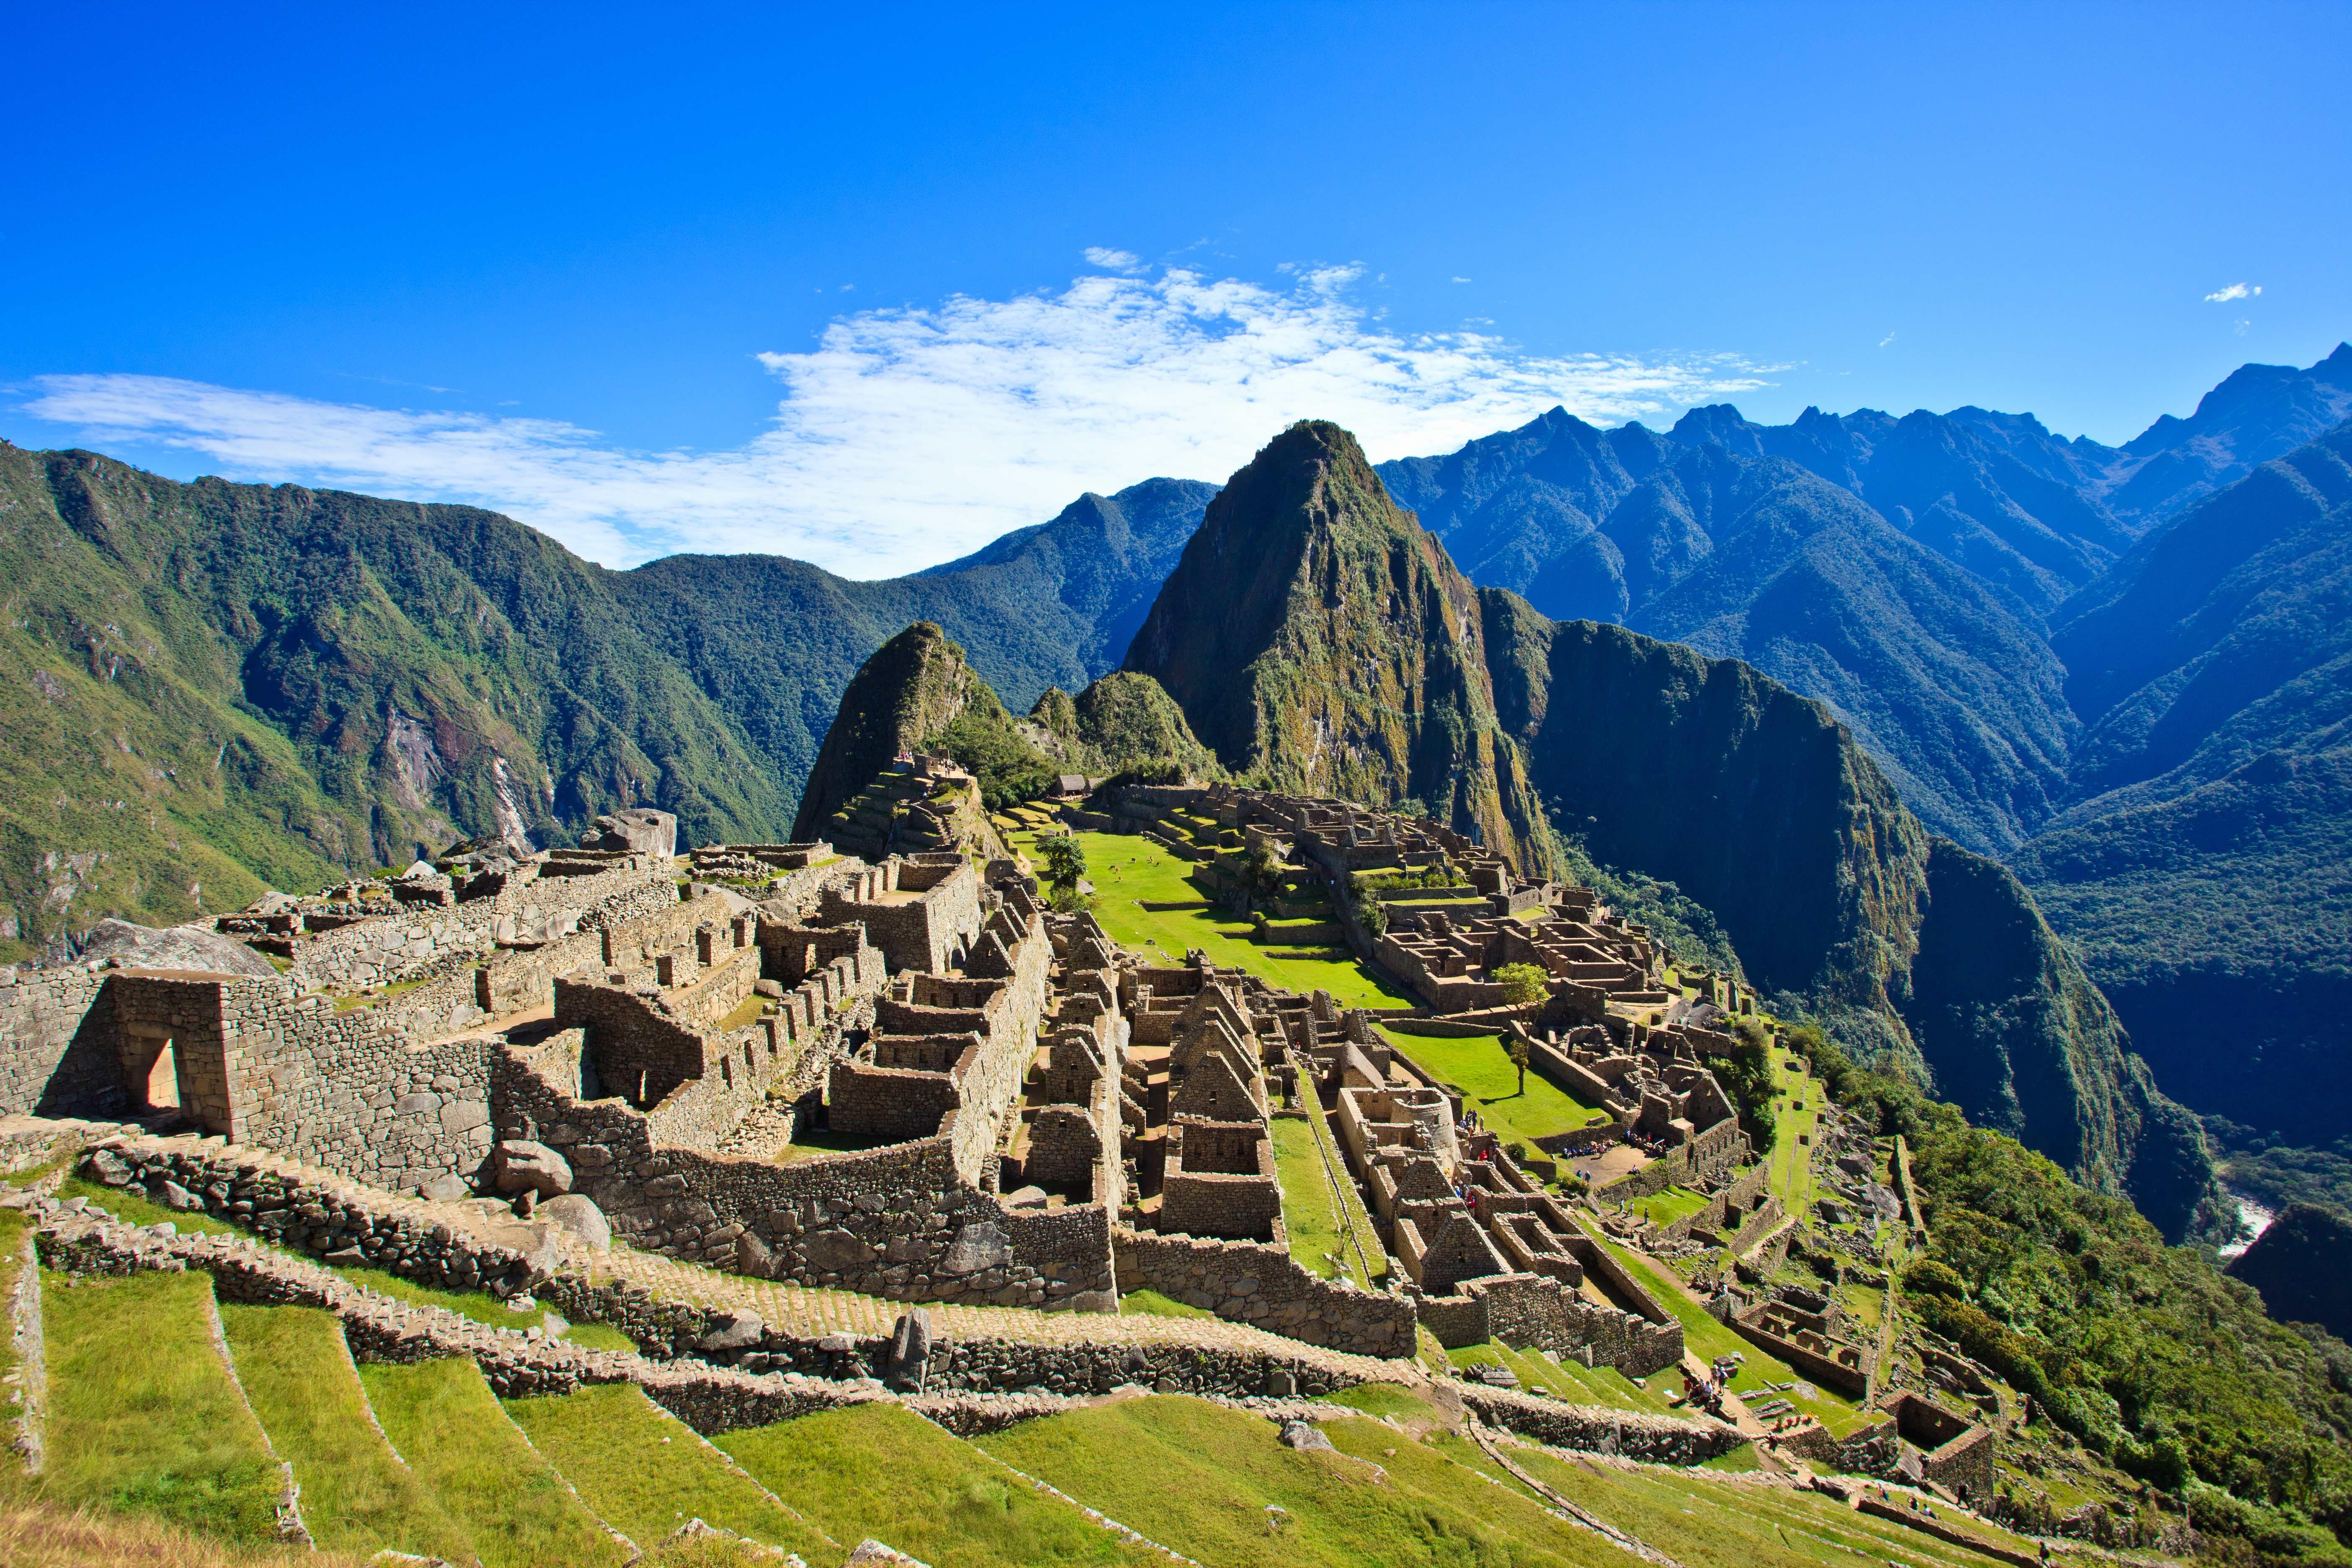 Peru Aims to Plant 1 Million Trees Around Machu Picchu